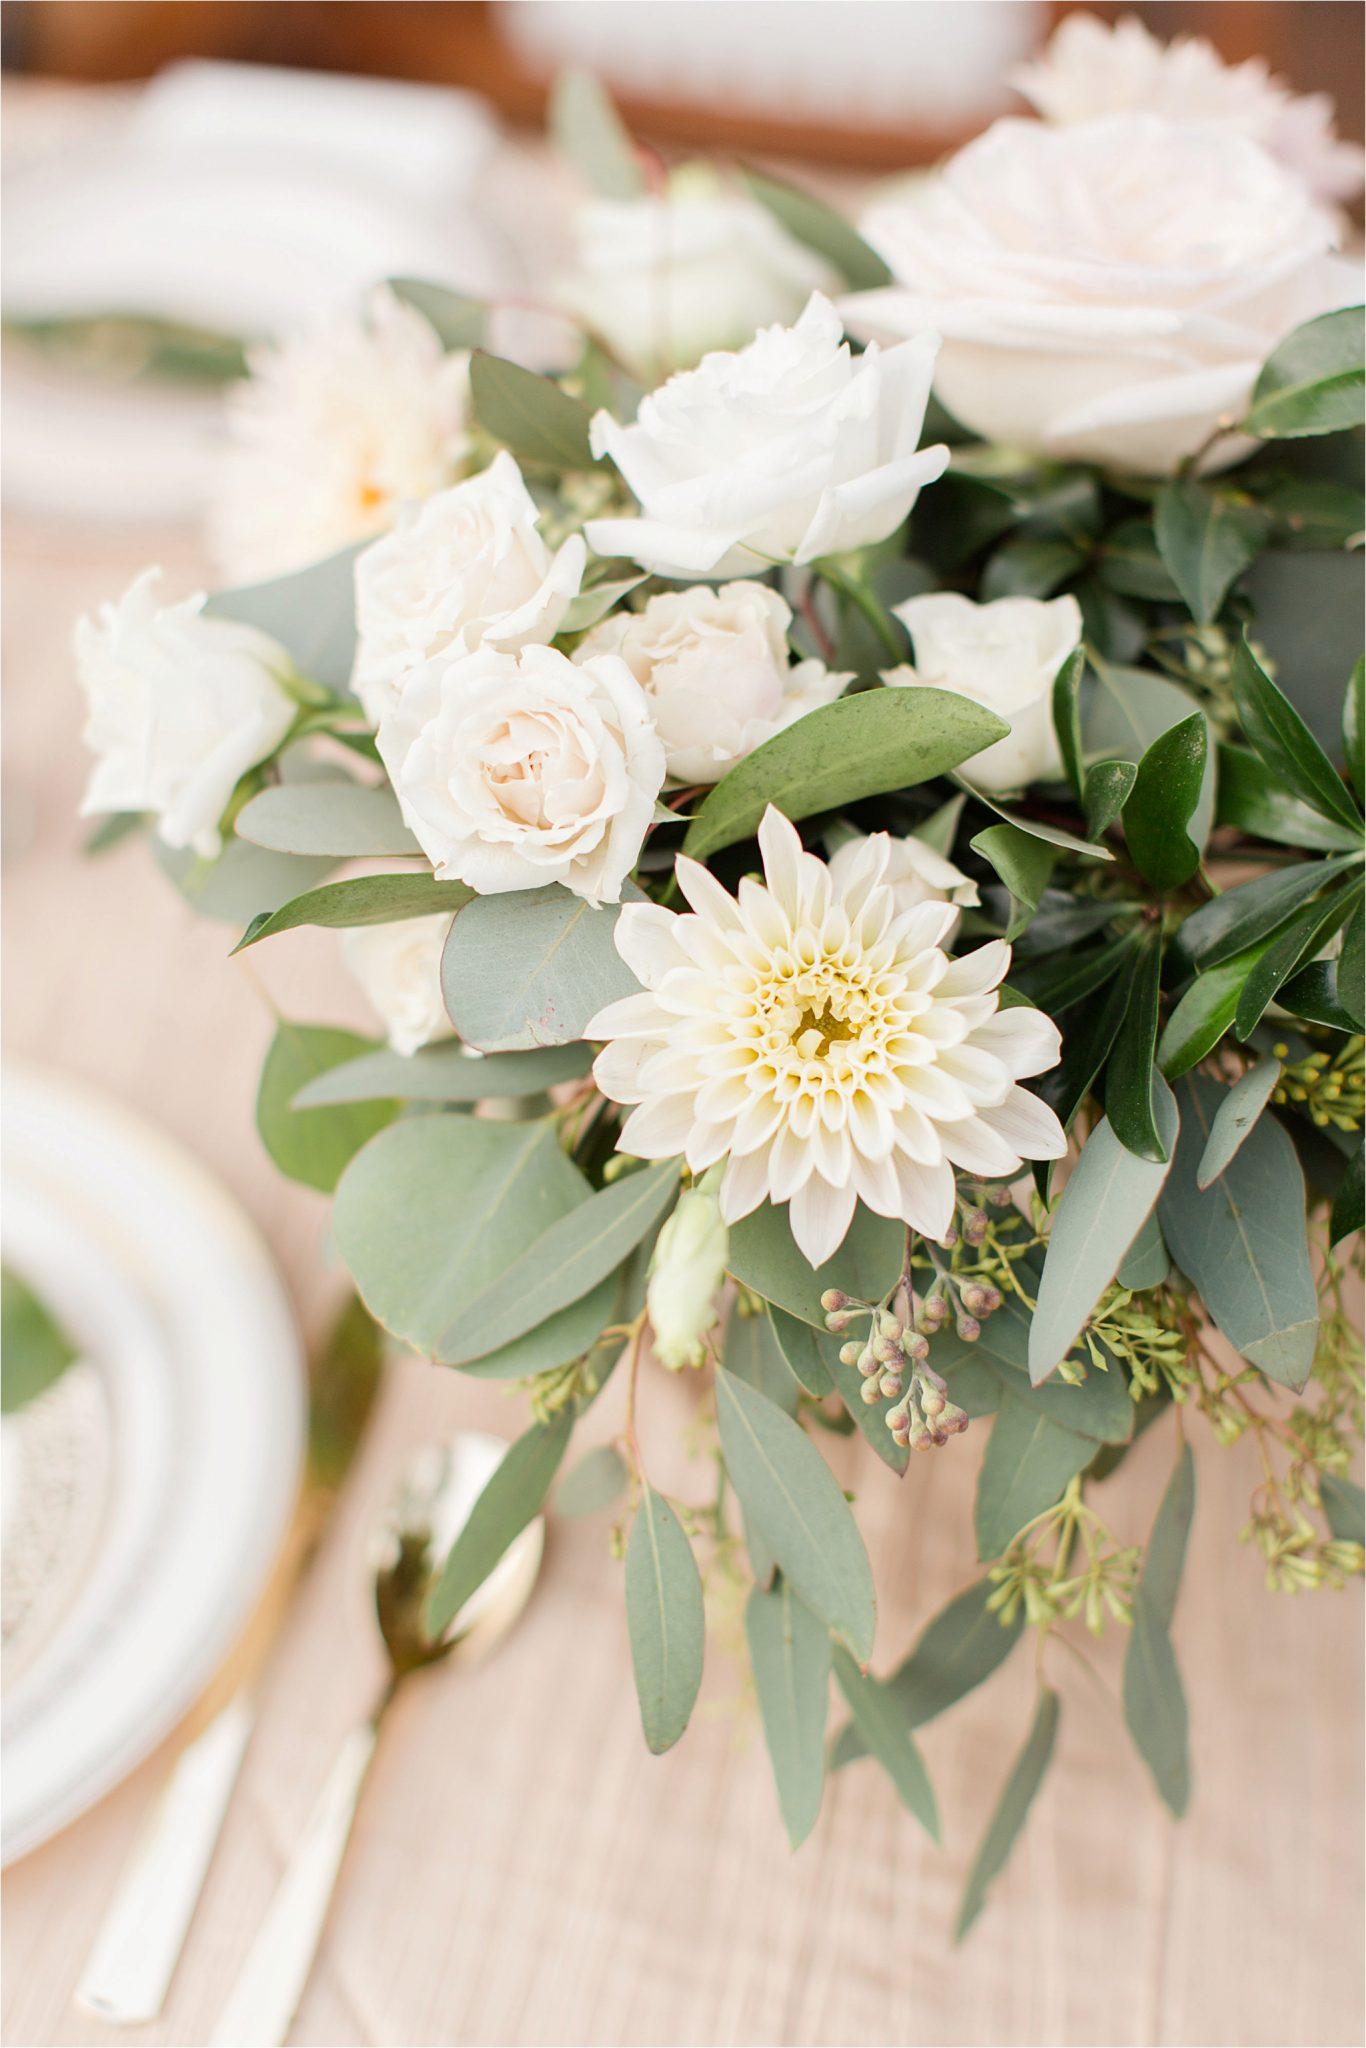 wedding-florals-flowers-white-roses-chrysanthemum